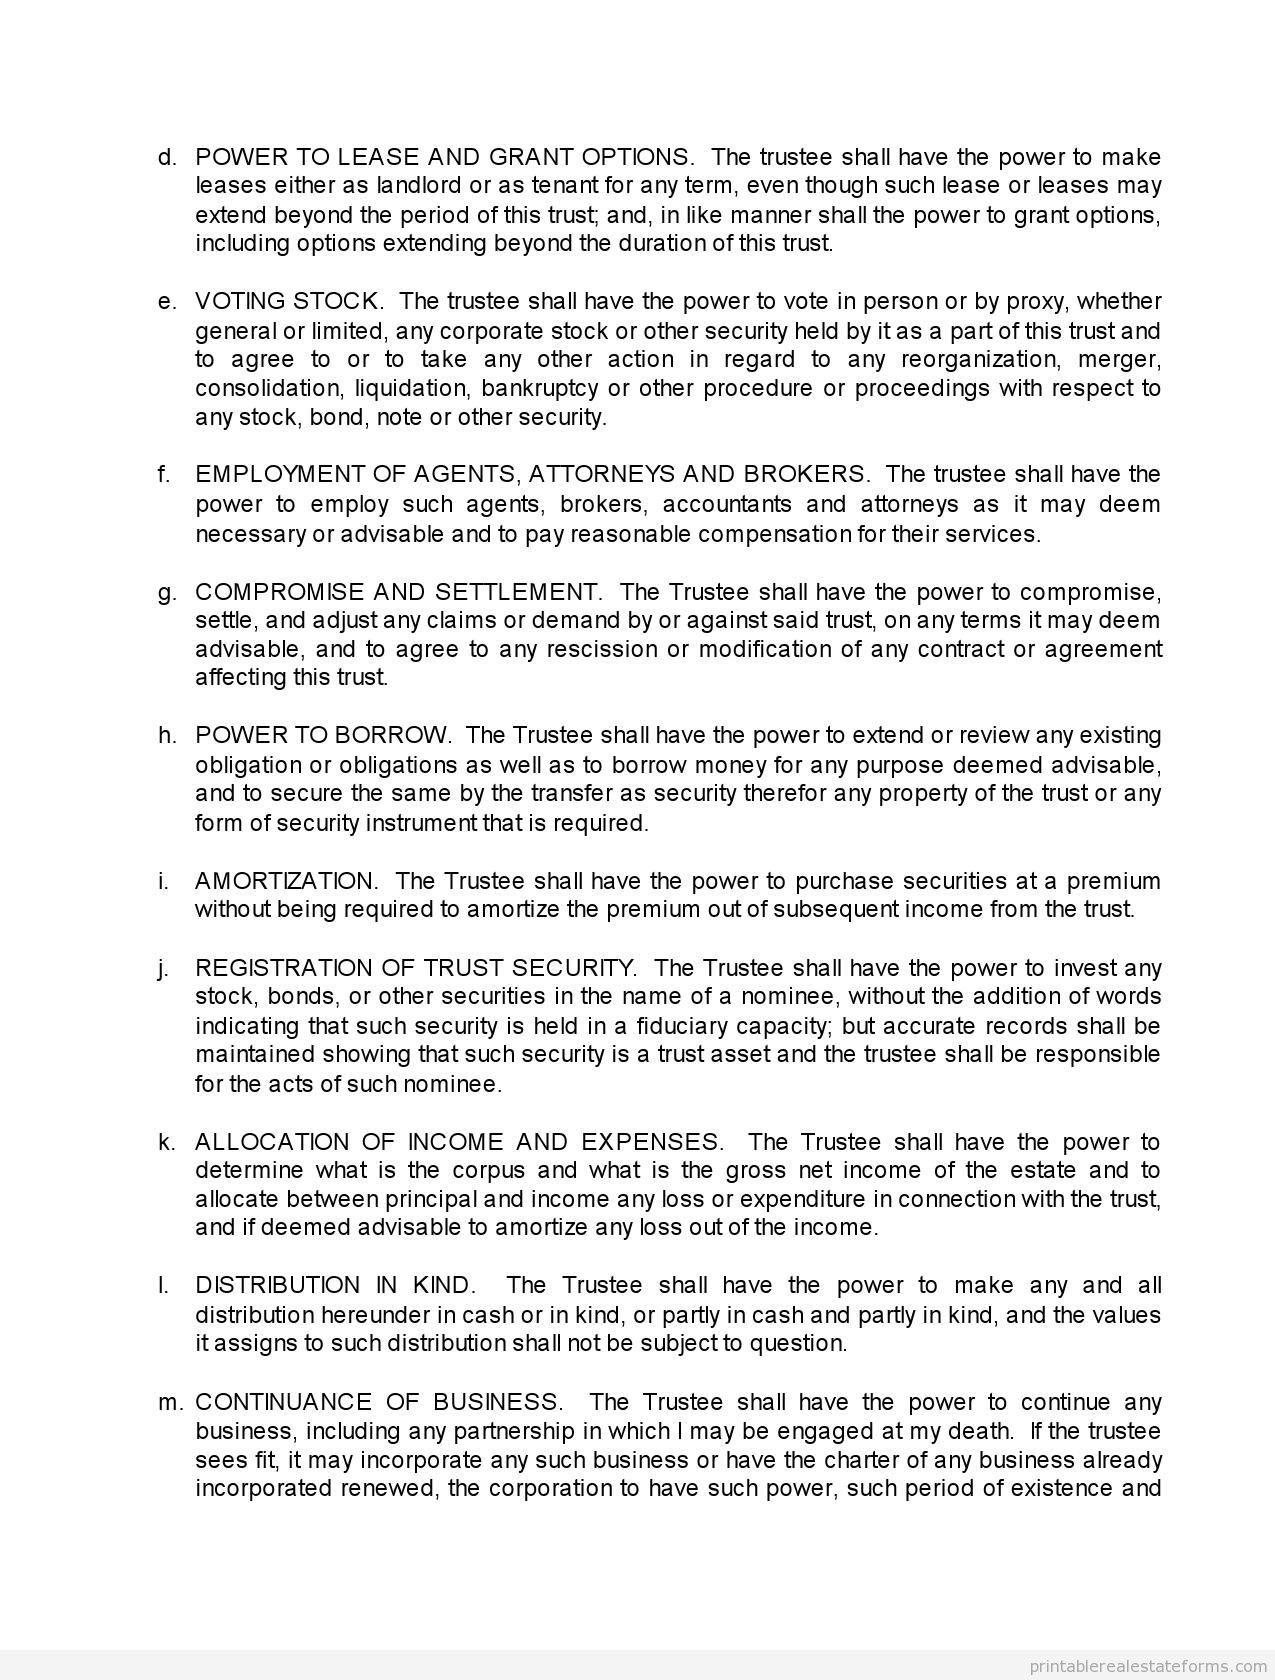 Sample Printable trust agreement Form | Sample Real Estate Forms ...